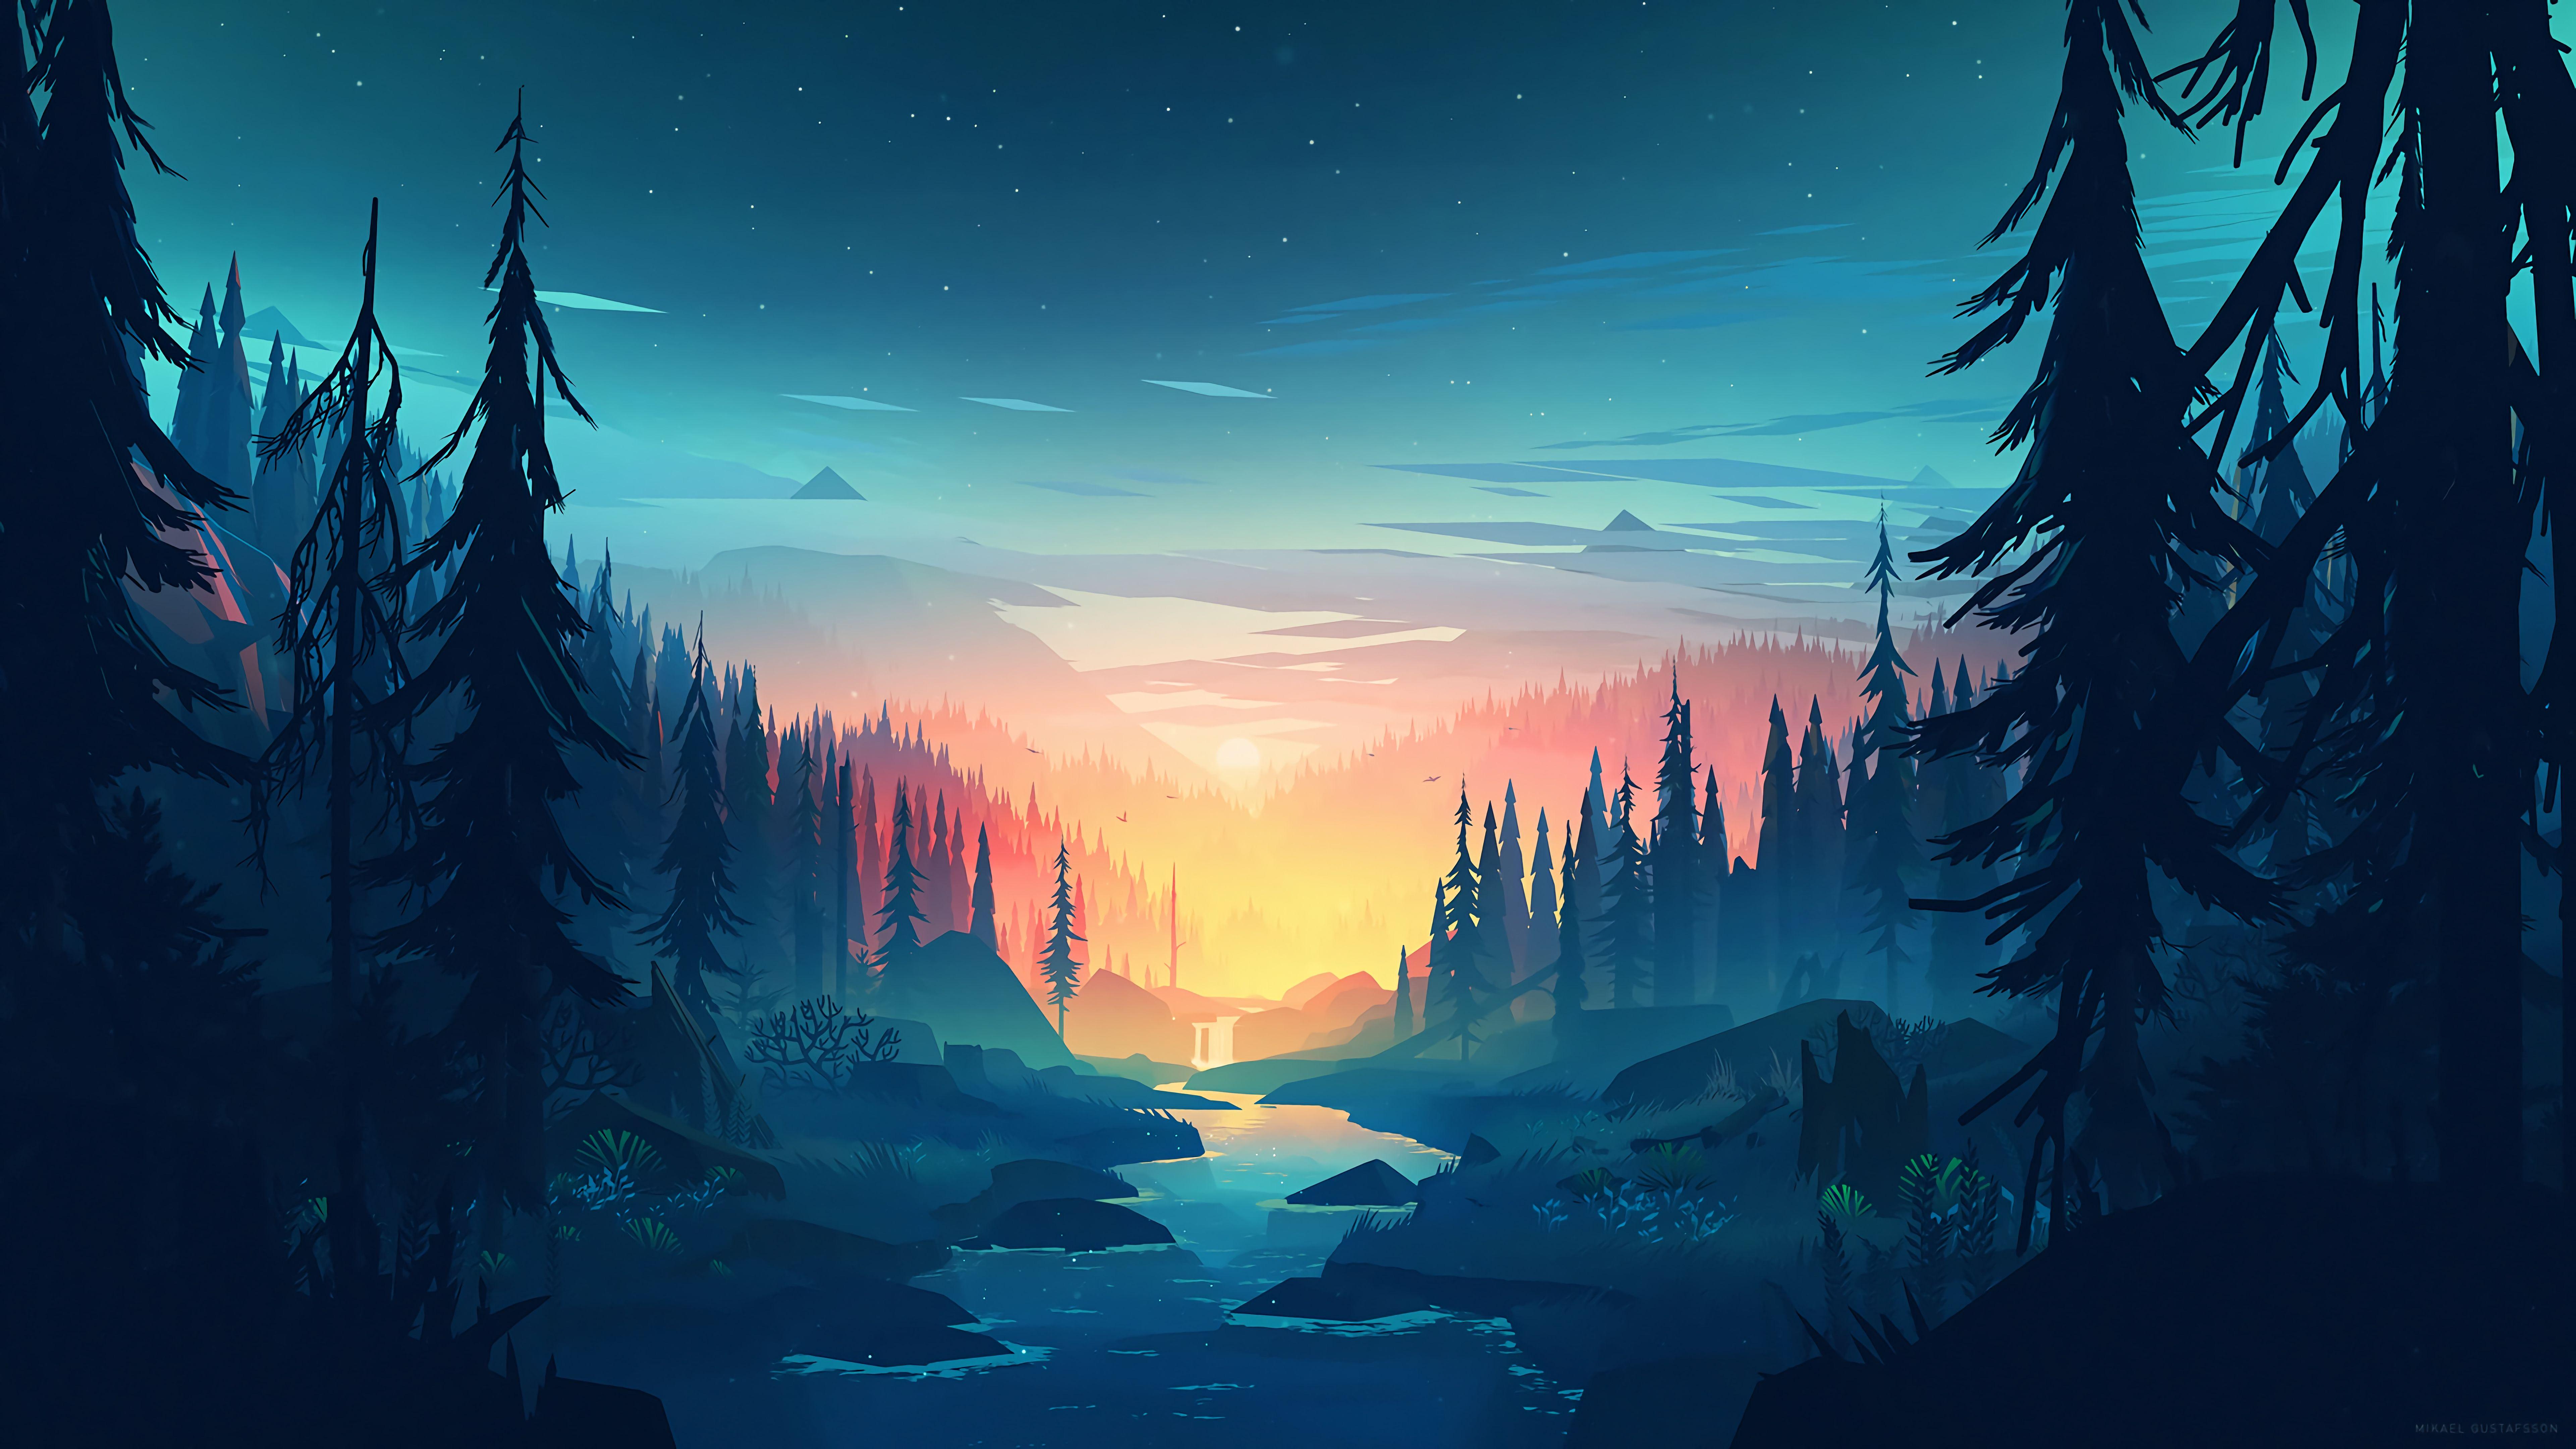 Minimalist Landscape Nature Sunrise River Mountains Trees 8k 2634 In 2020 Scenery Wallpaper Landscape Wallpaper Desktop Wallpaper Art